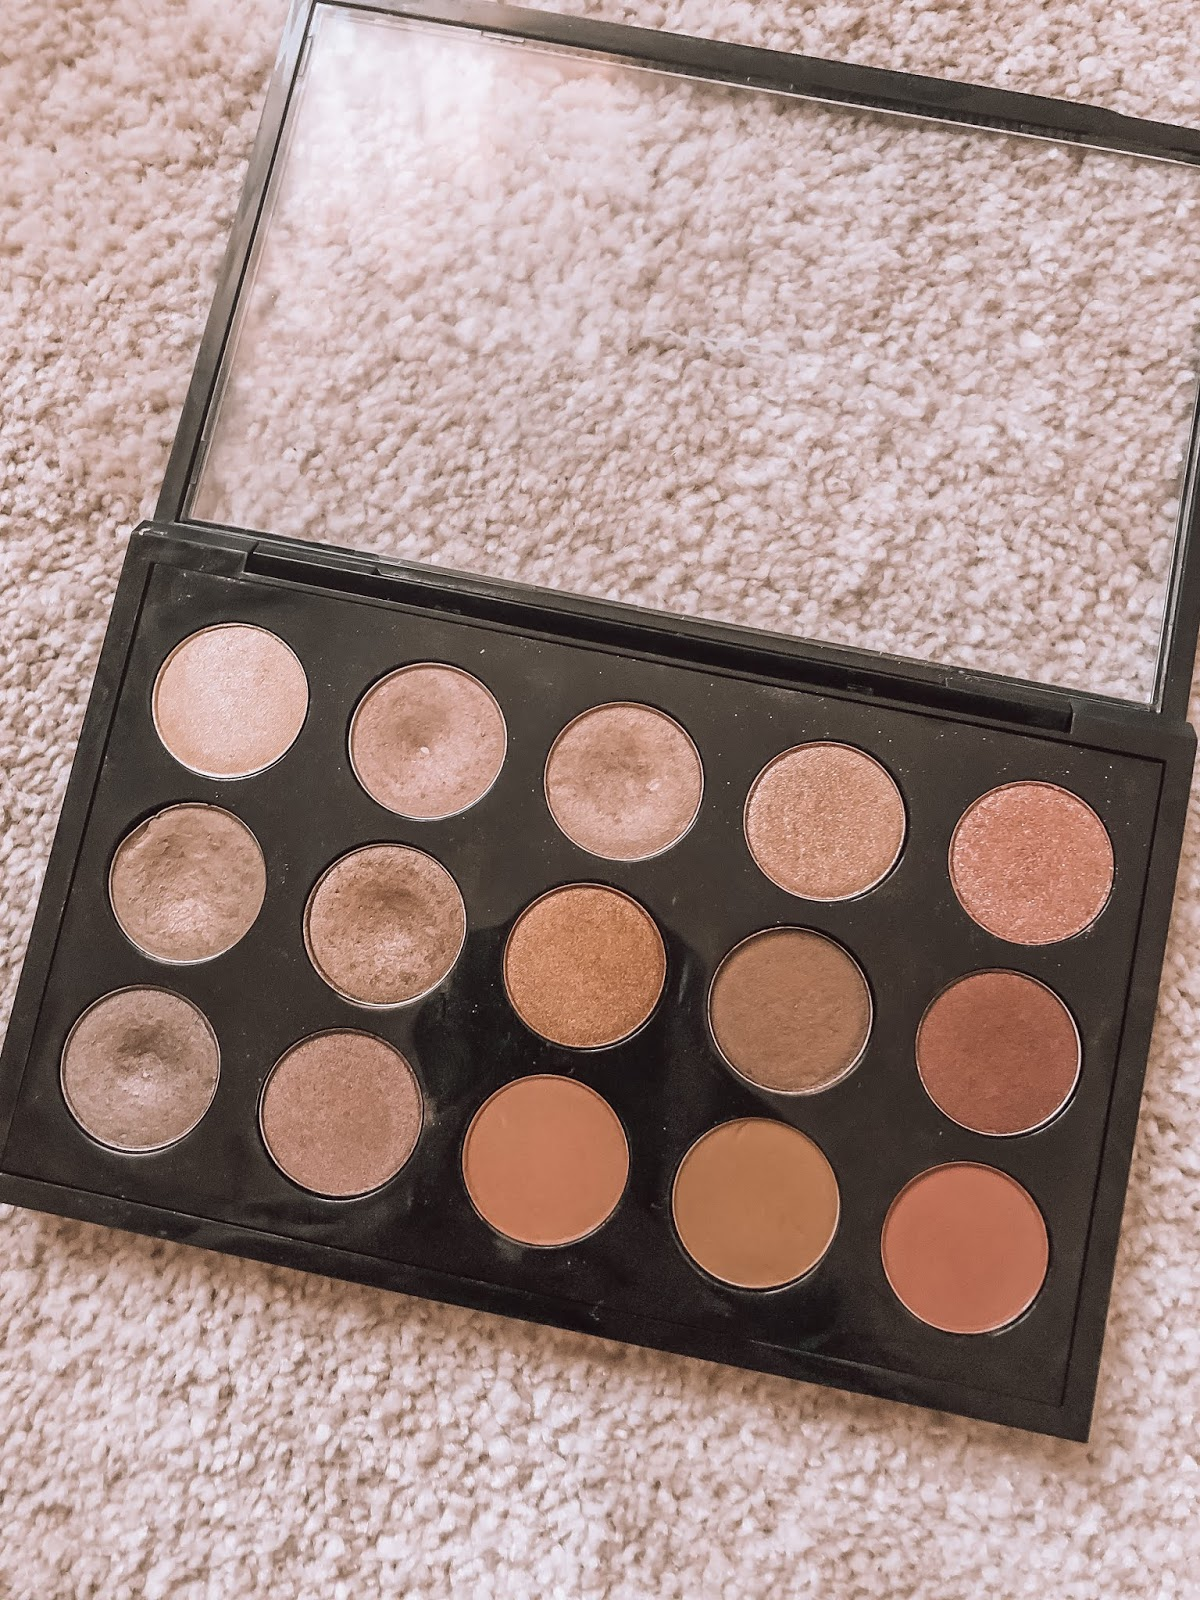 mac custom palette, warm brown pinks